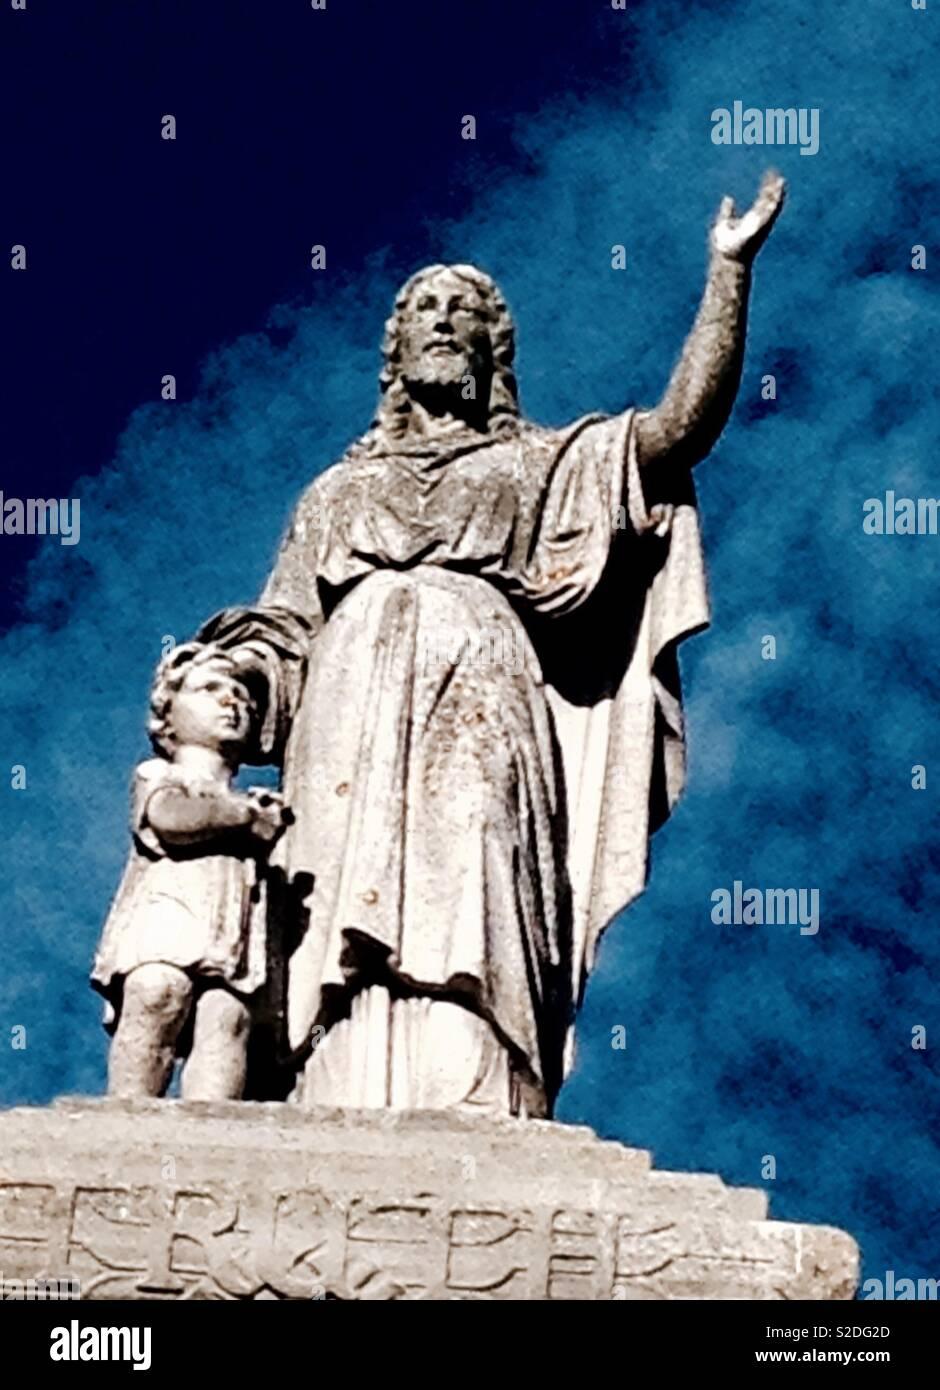 Monumental masonry atop Victorian mausoleum in London - Stock Image